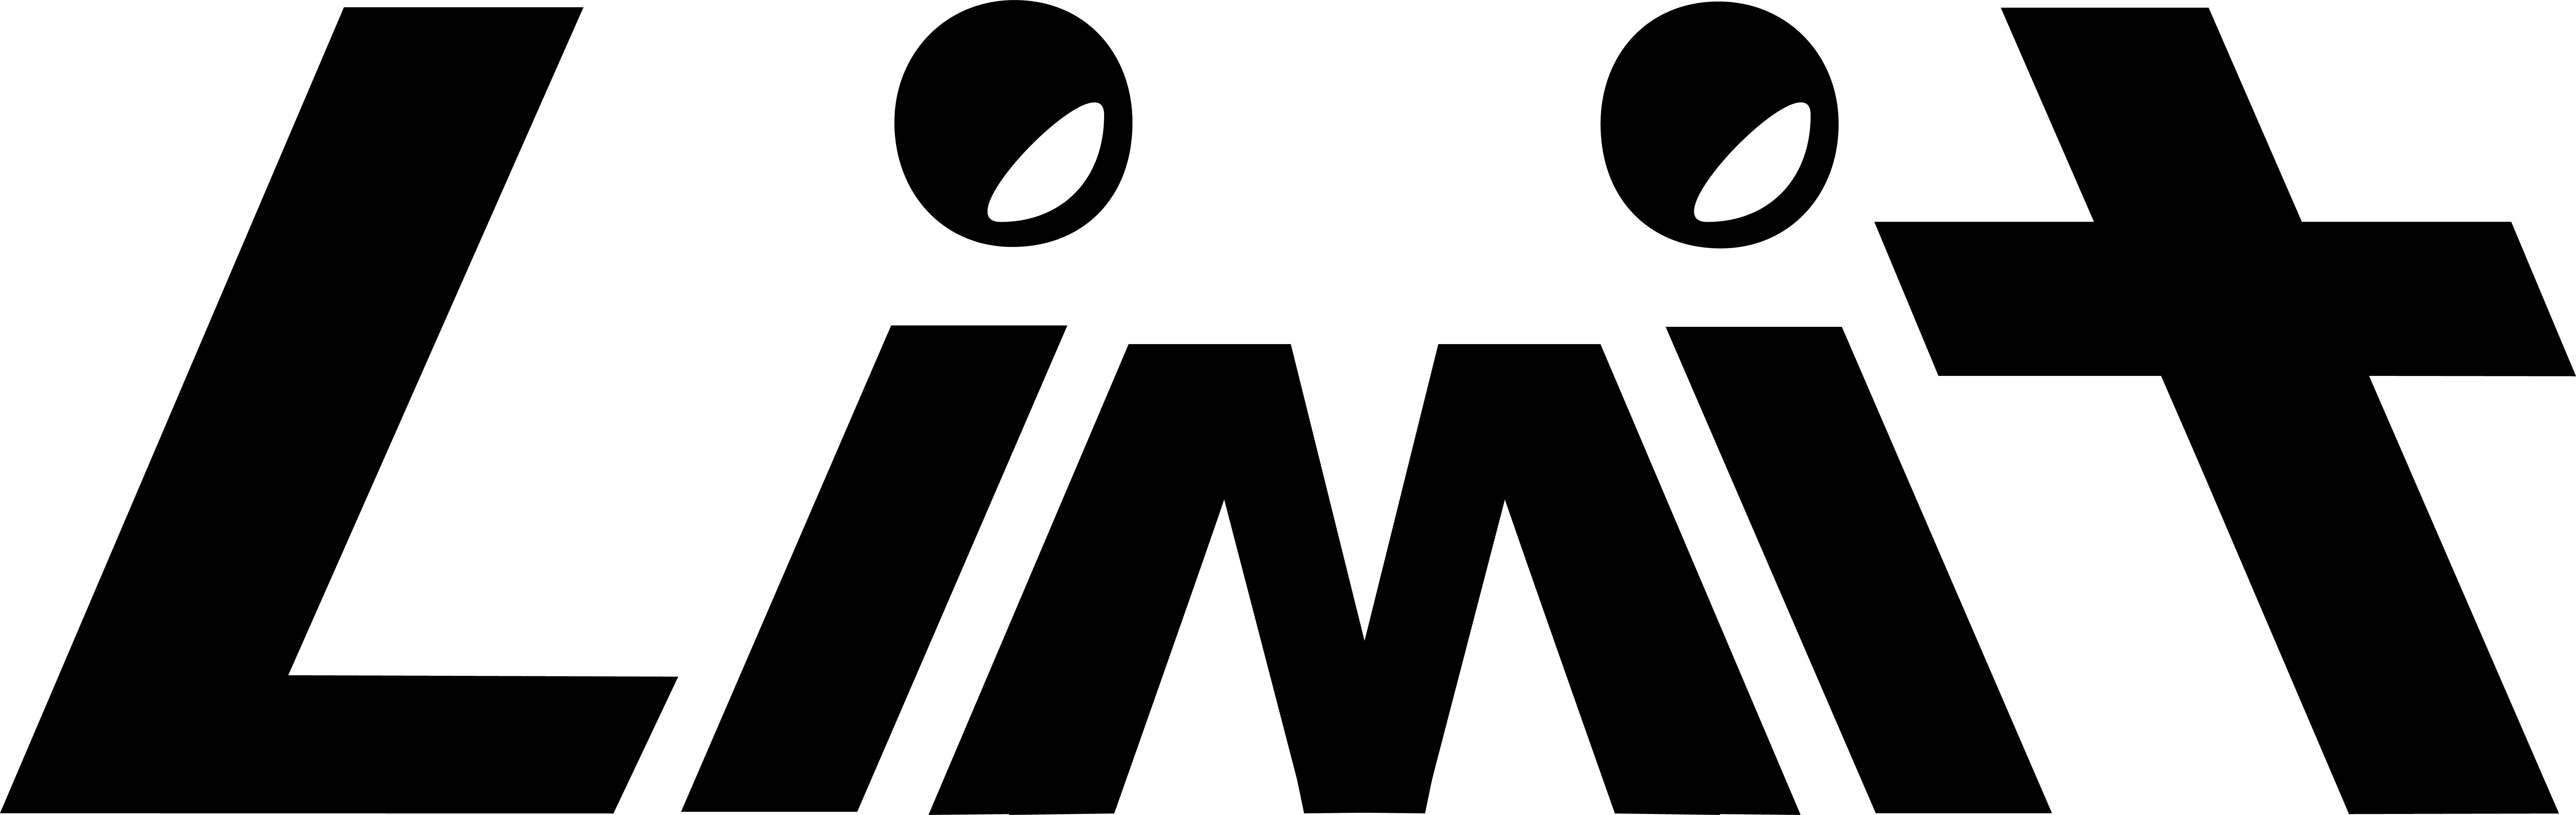 Limit ロゴ